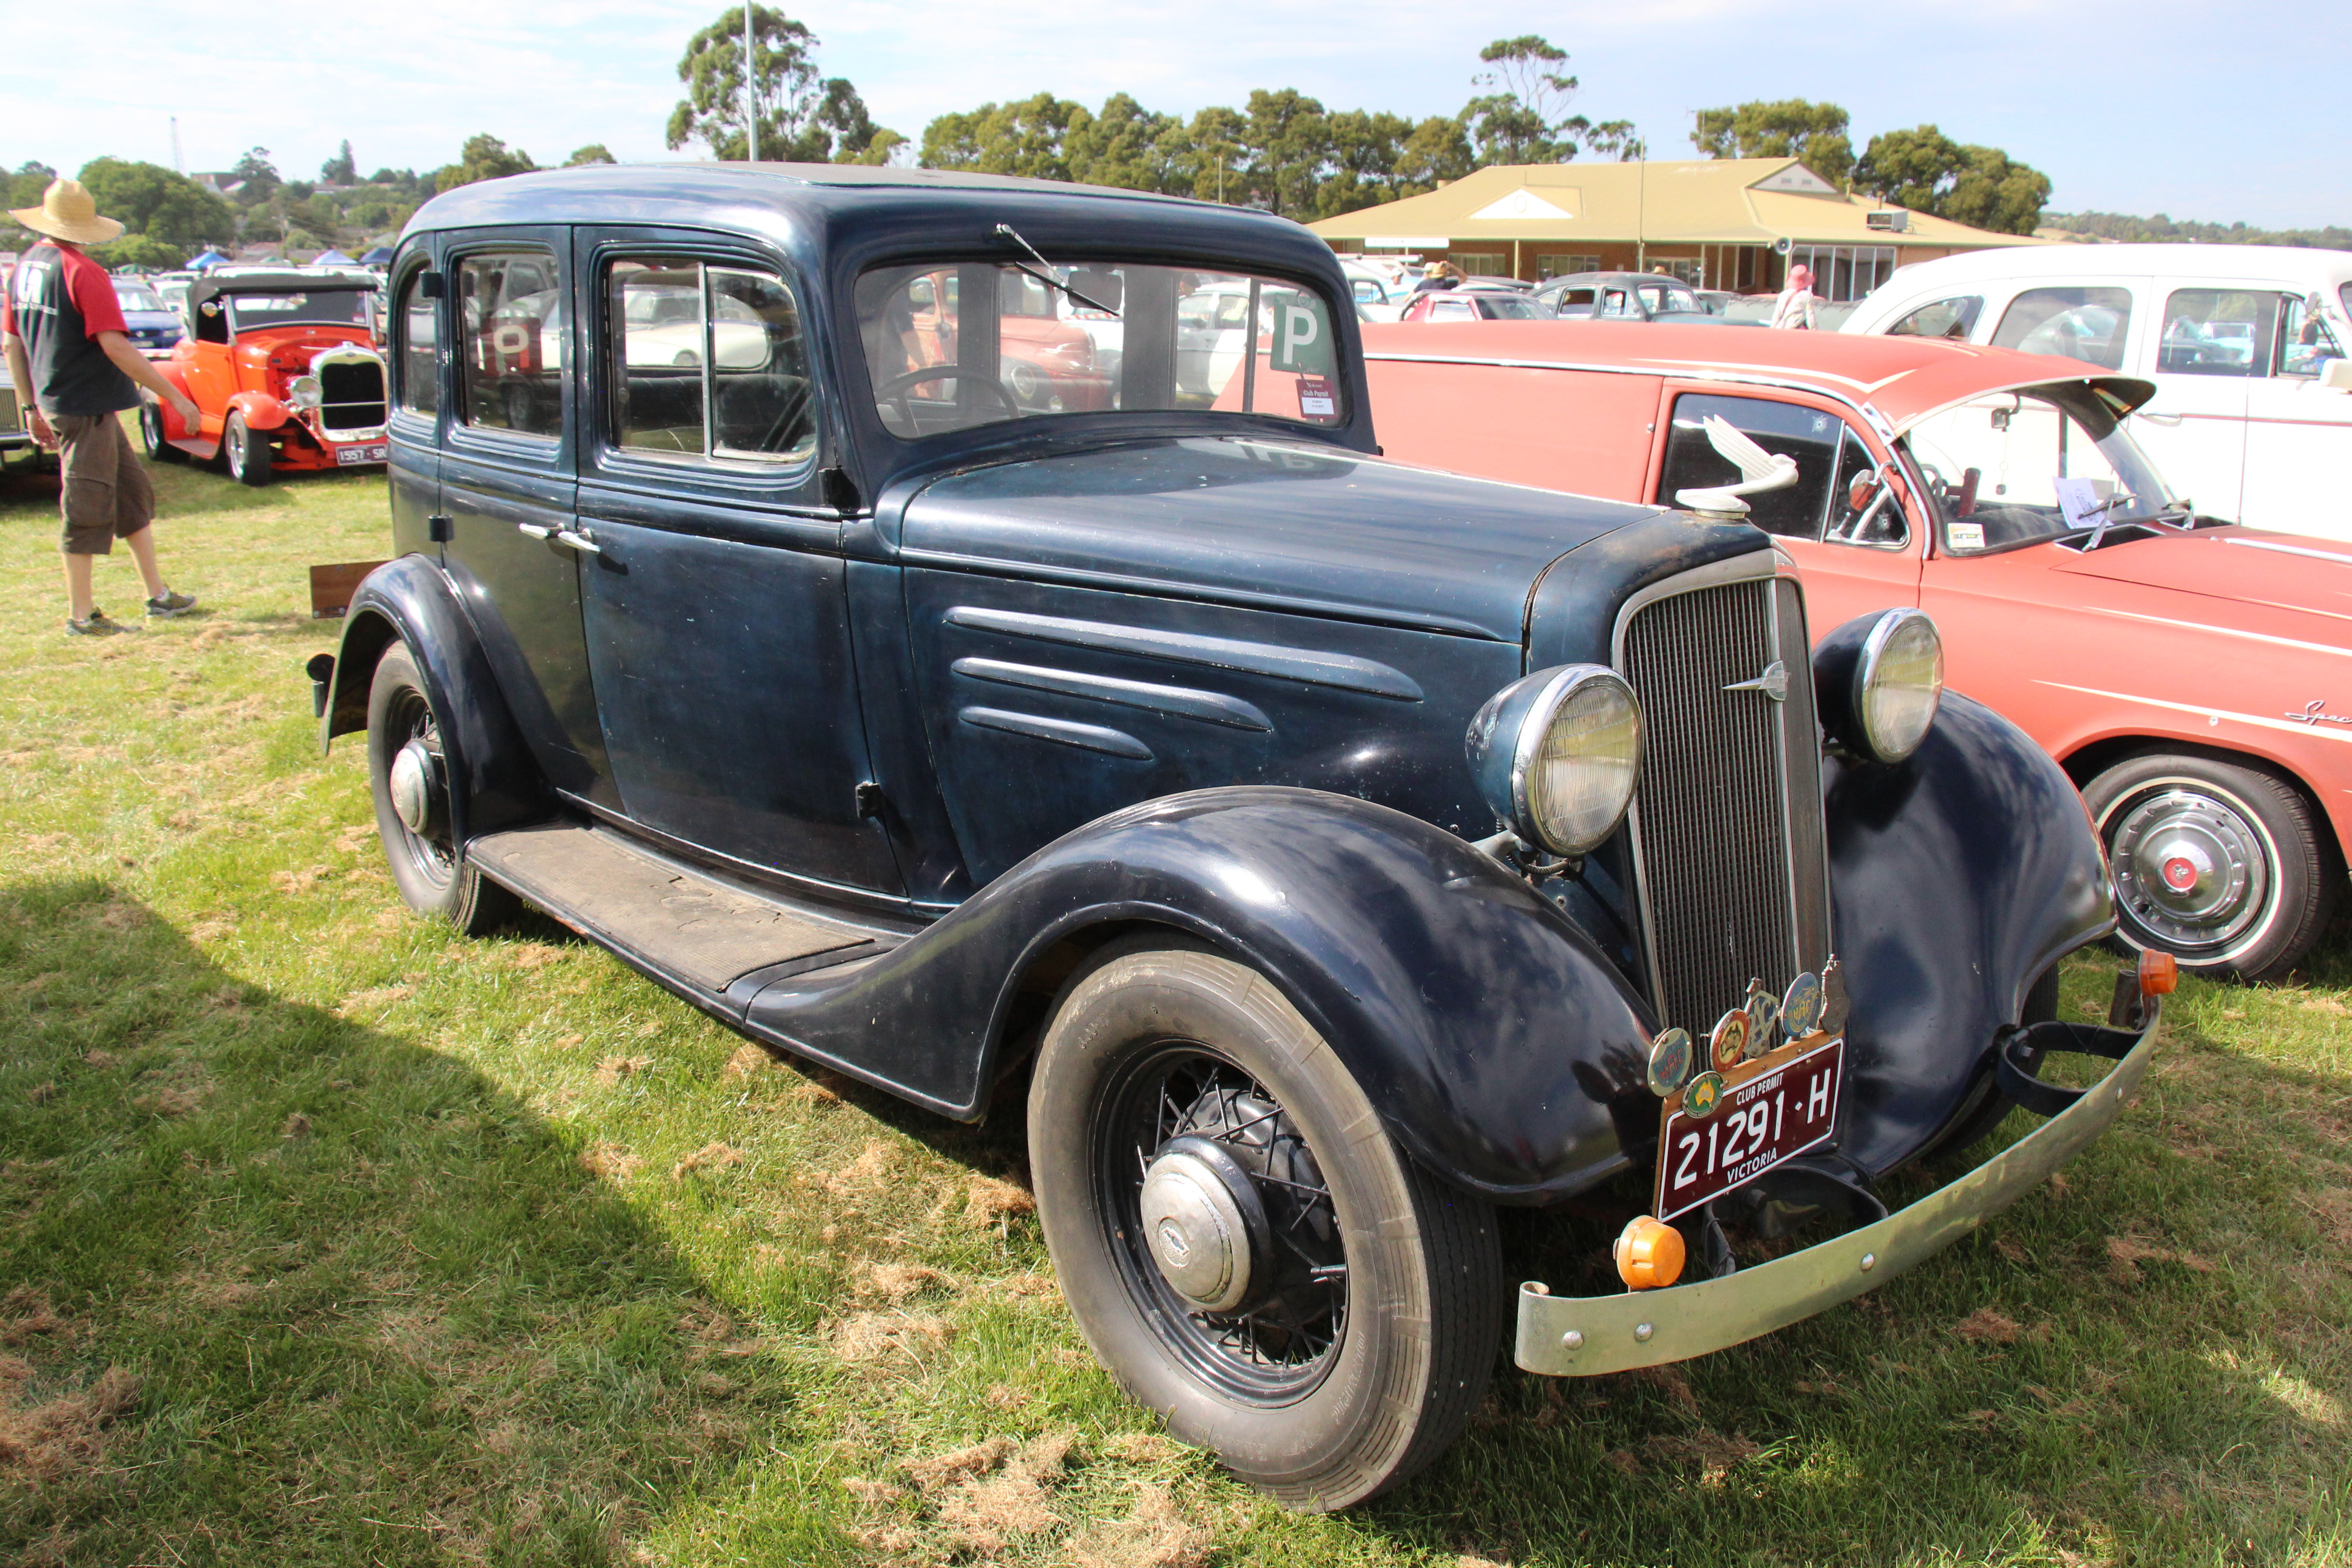 File:1934 Chevrolet DC Standard Sedan (32153185756).jpg - Wikimedia Commons